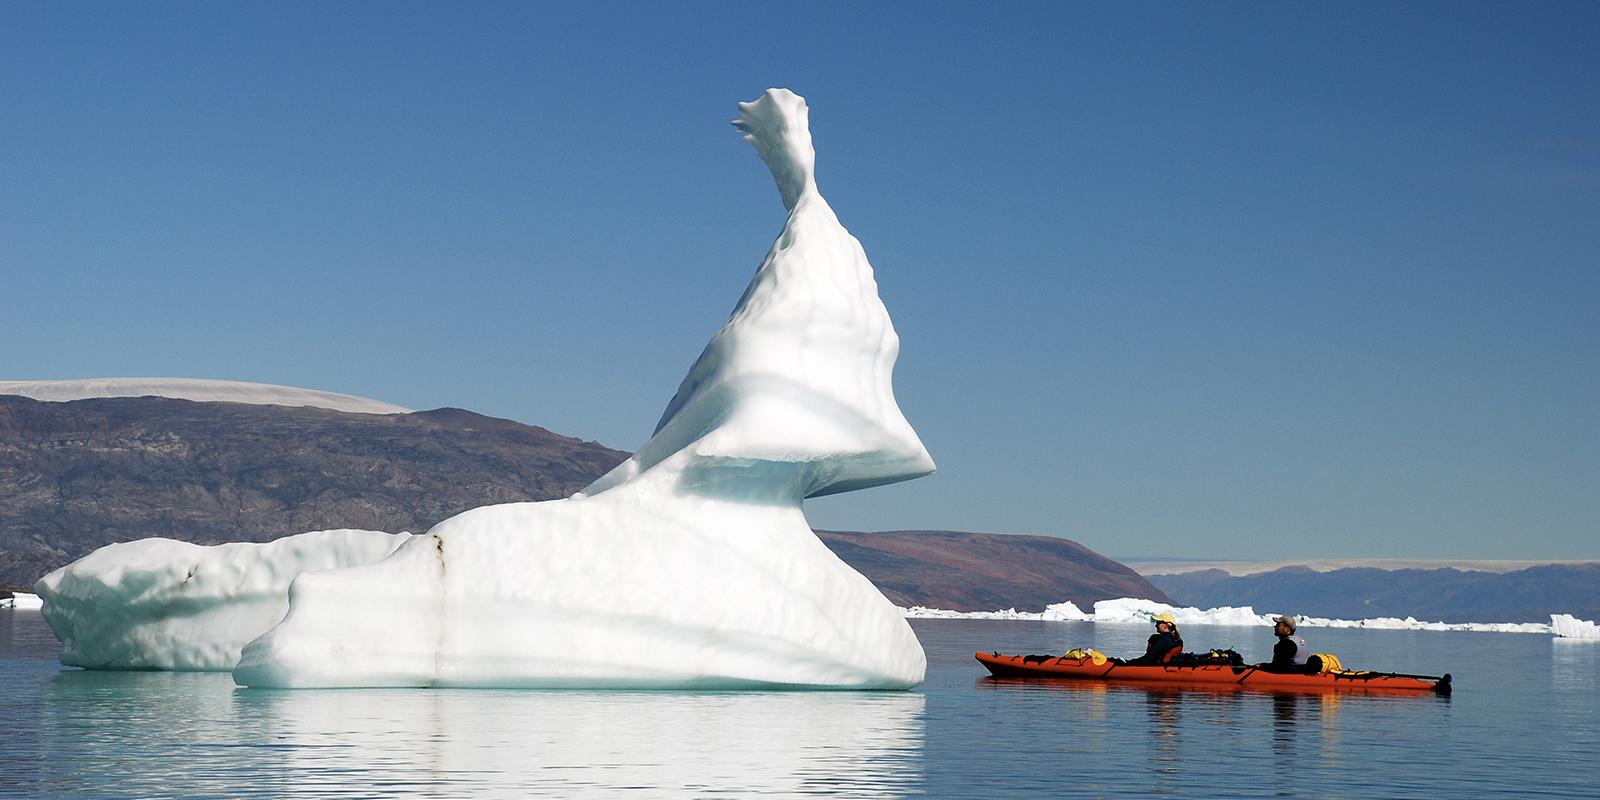 Scoresbysund, Greenland (Black Feather)